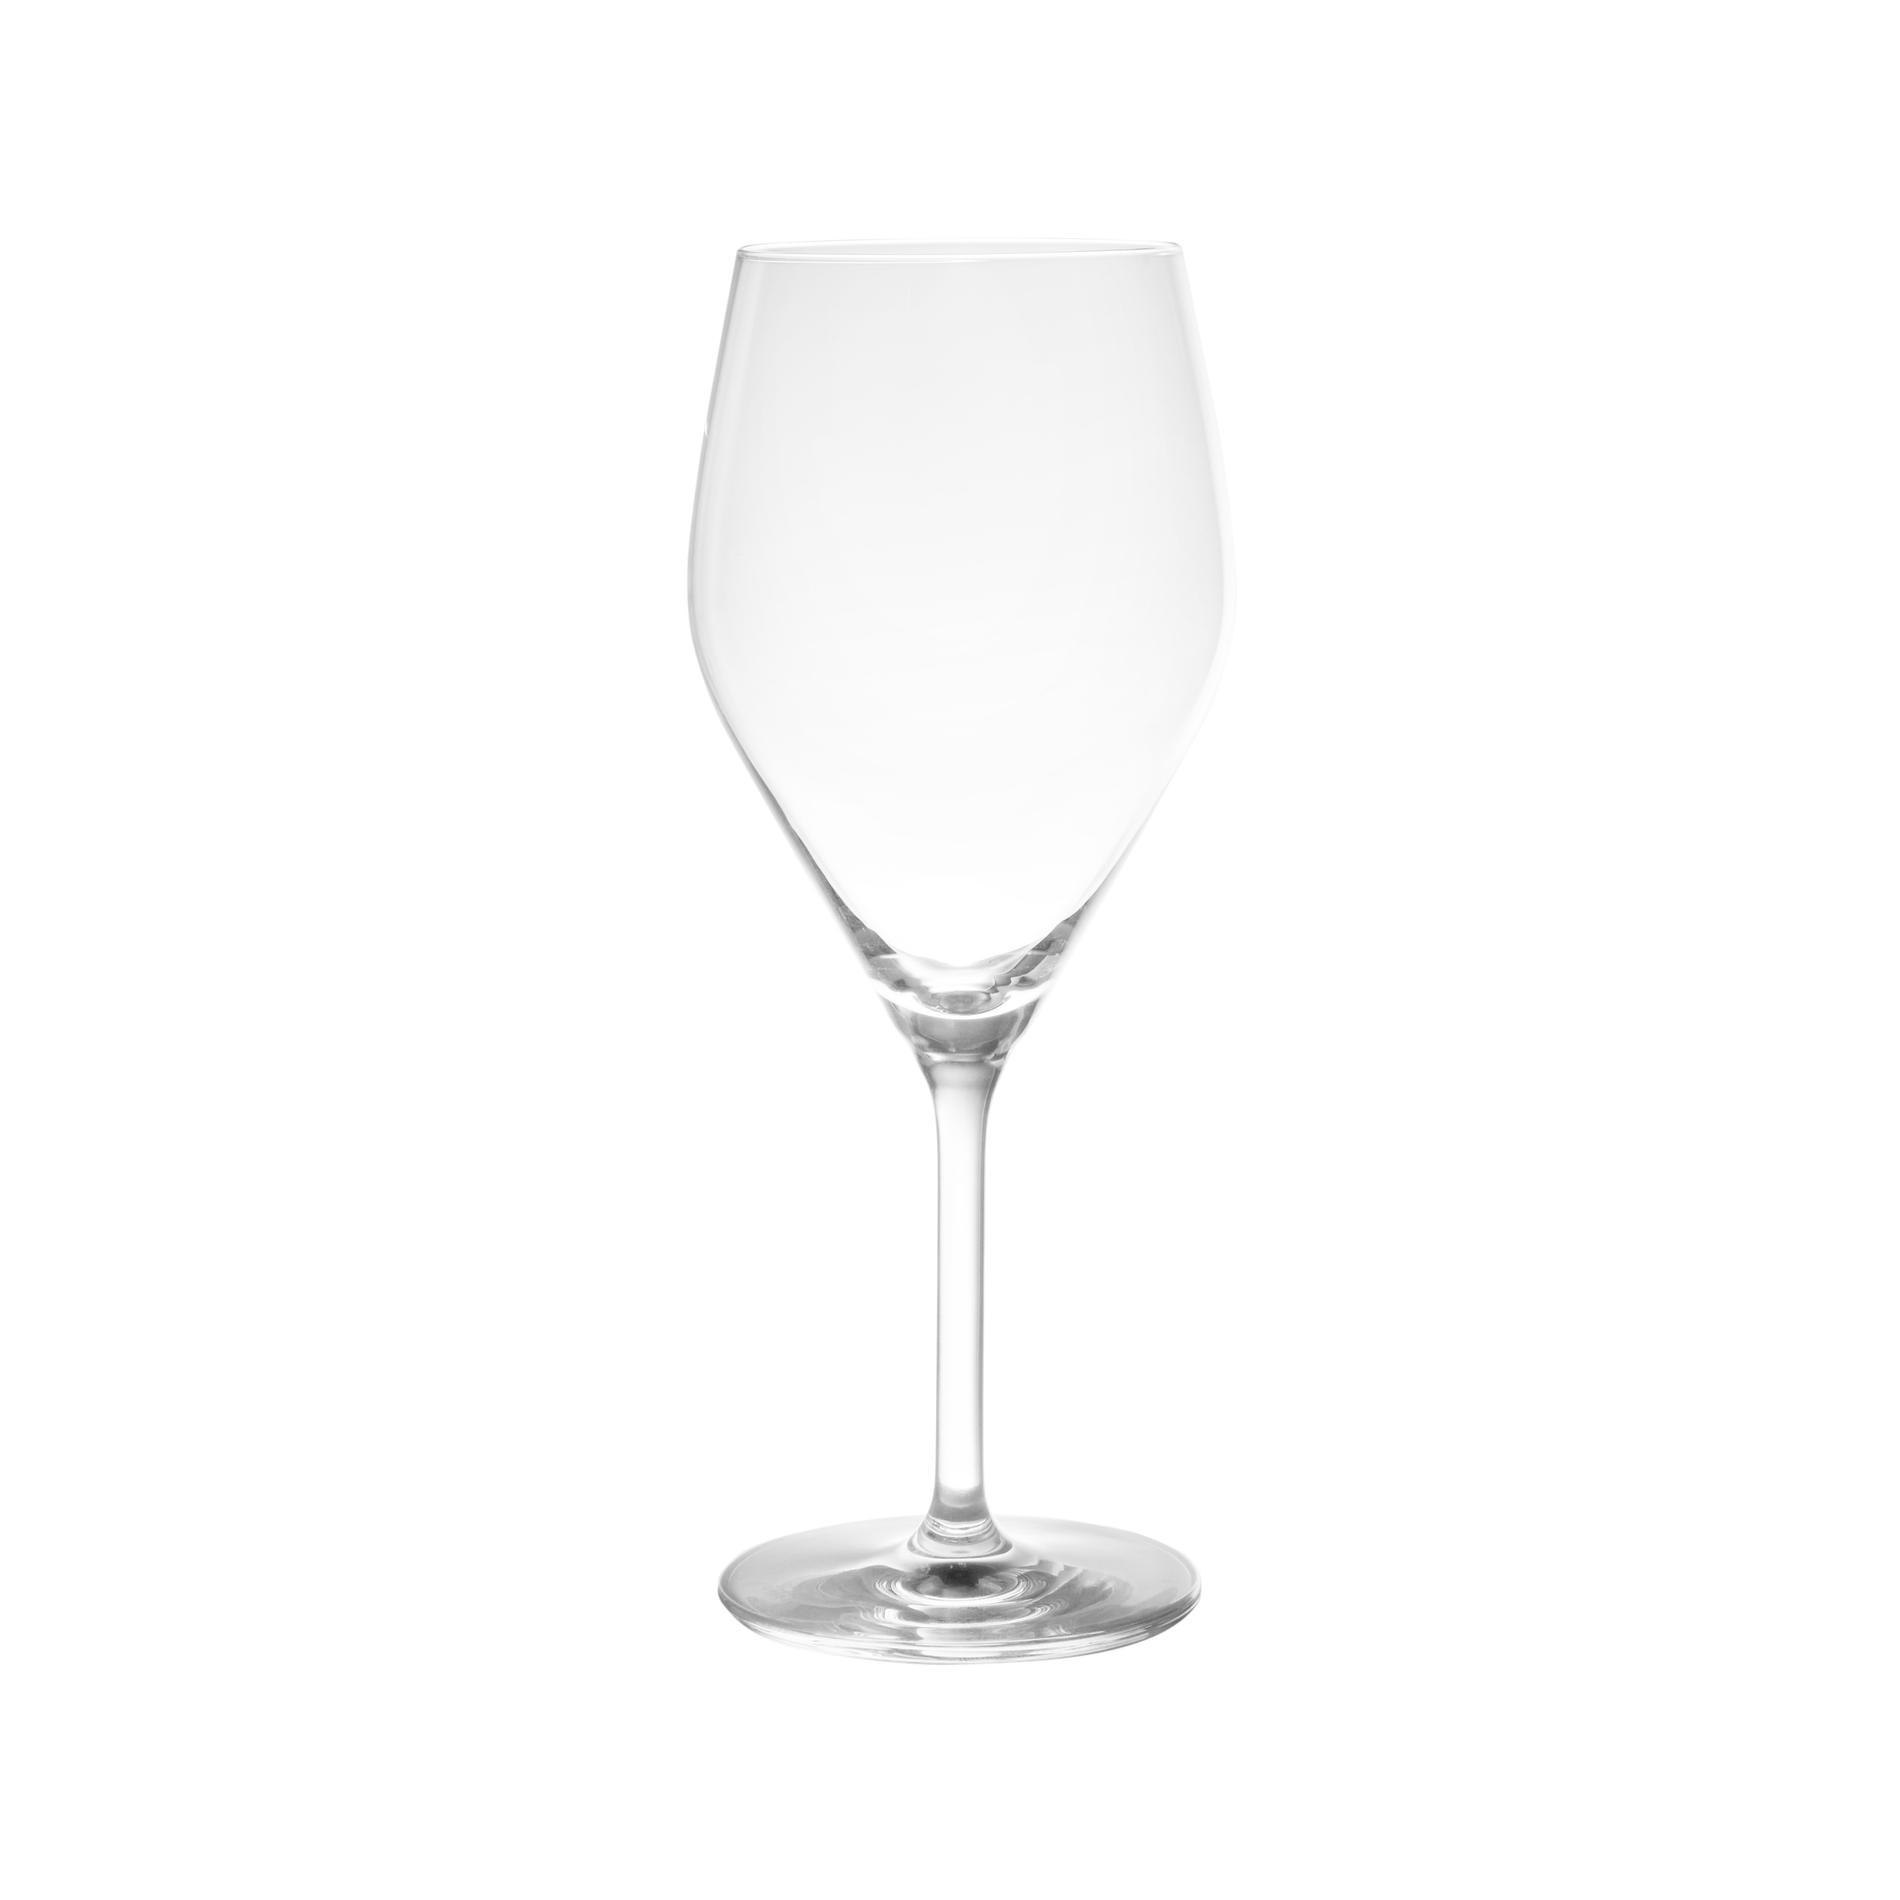 I Calici Da Degustazione : Calice vino da degustazione coincasa